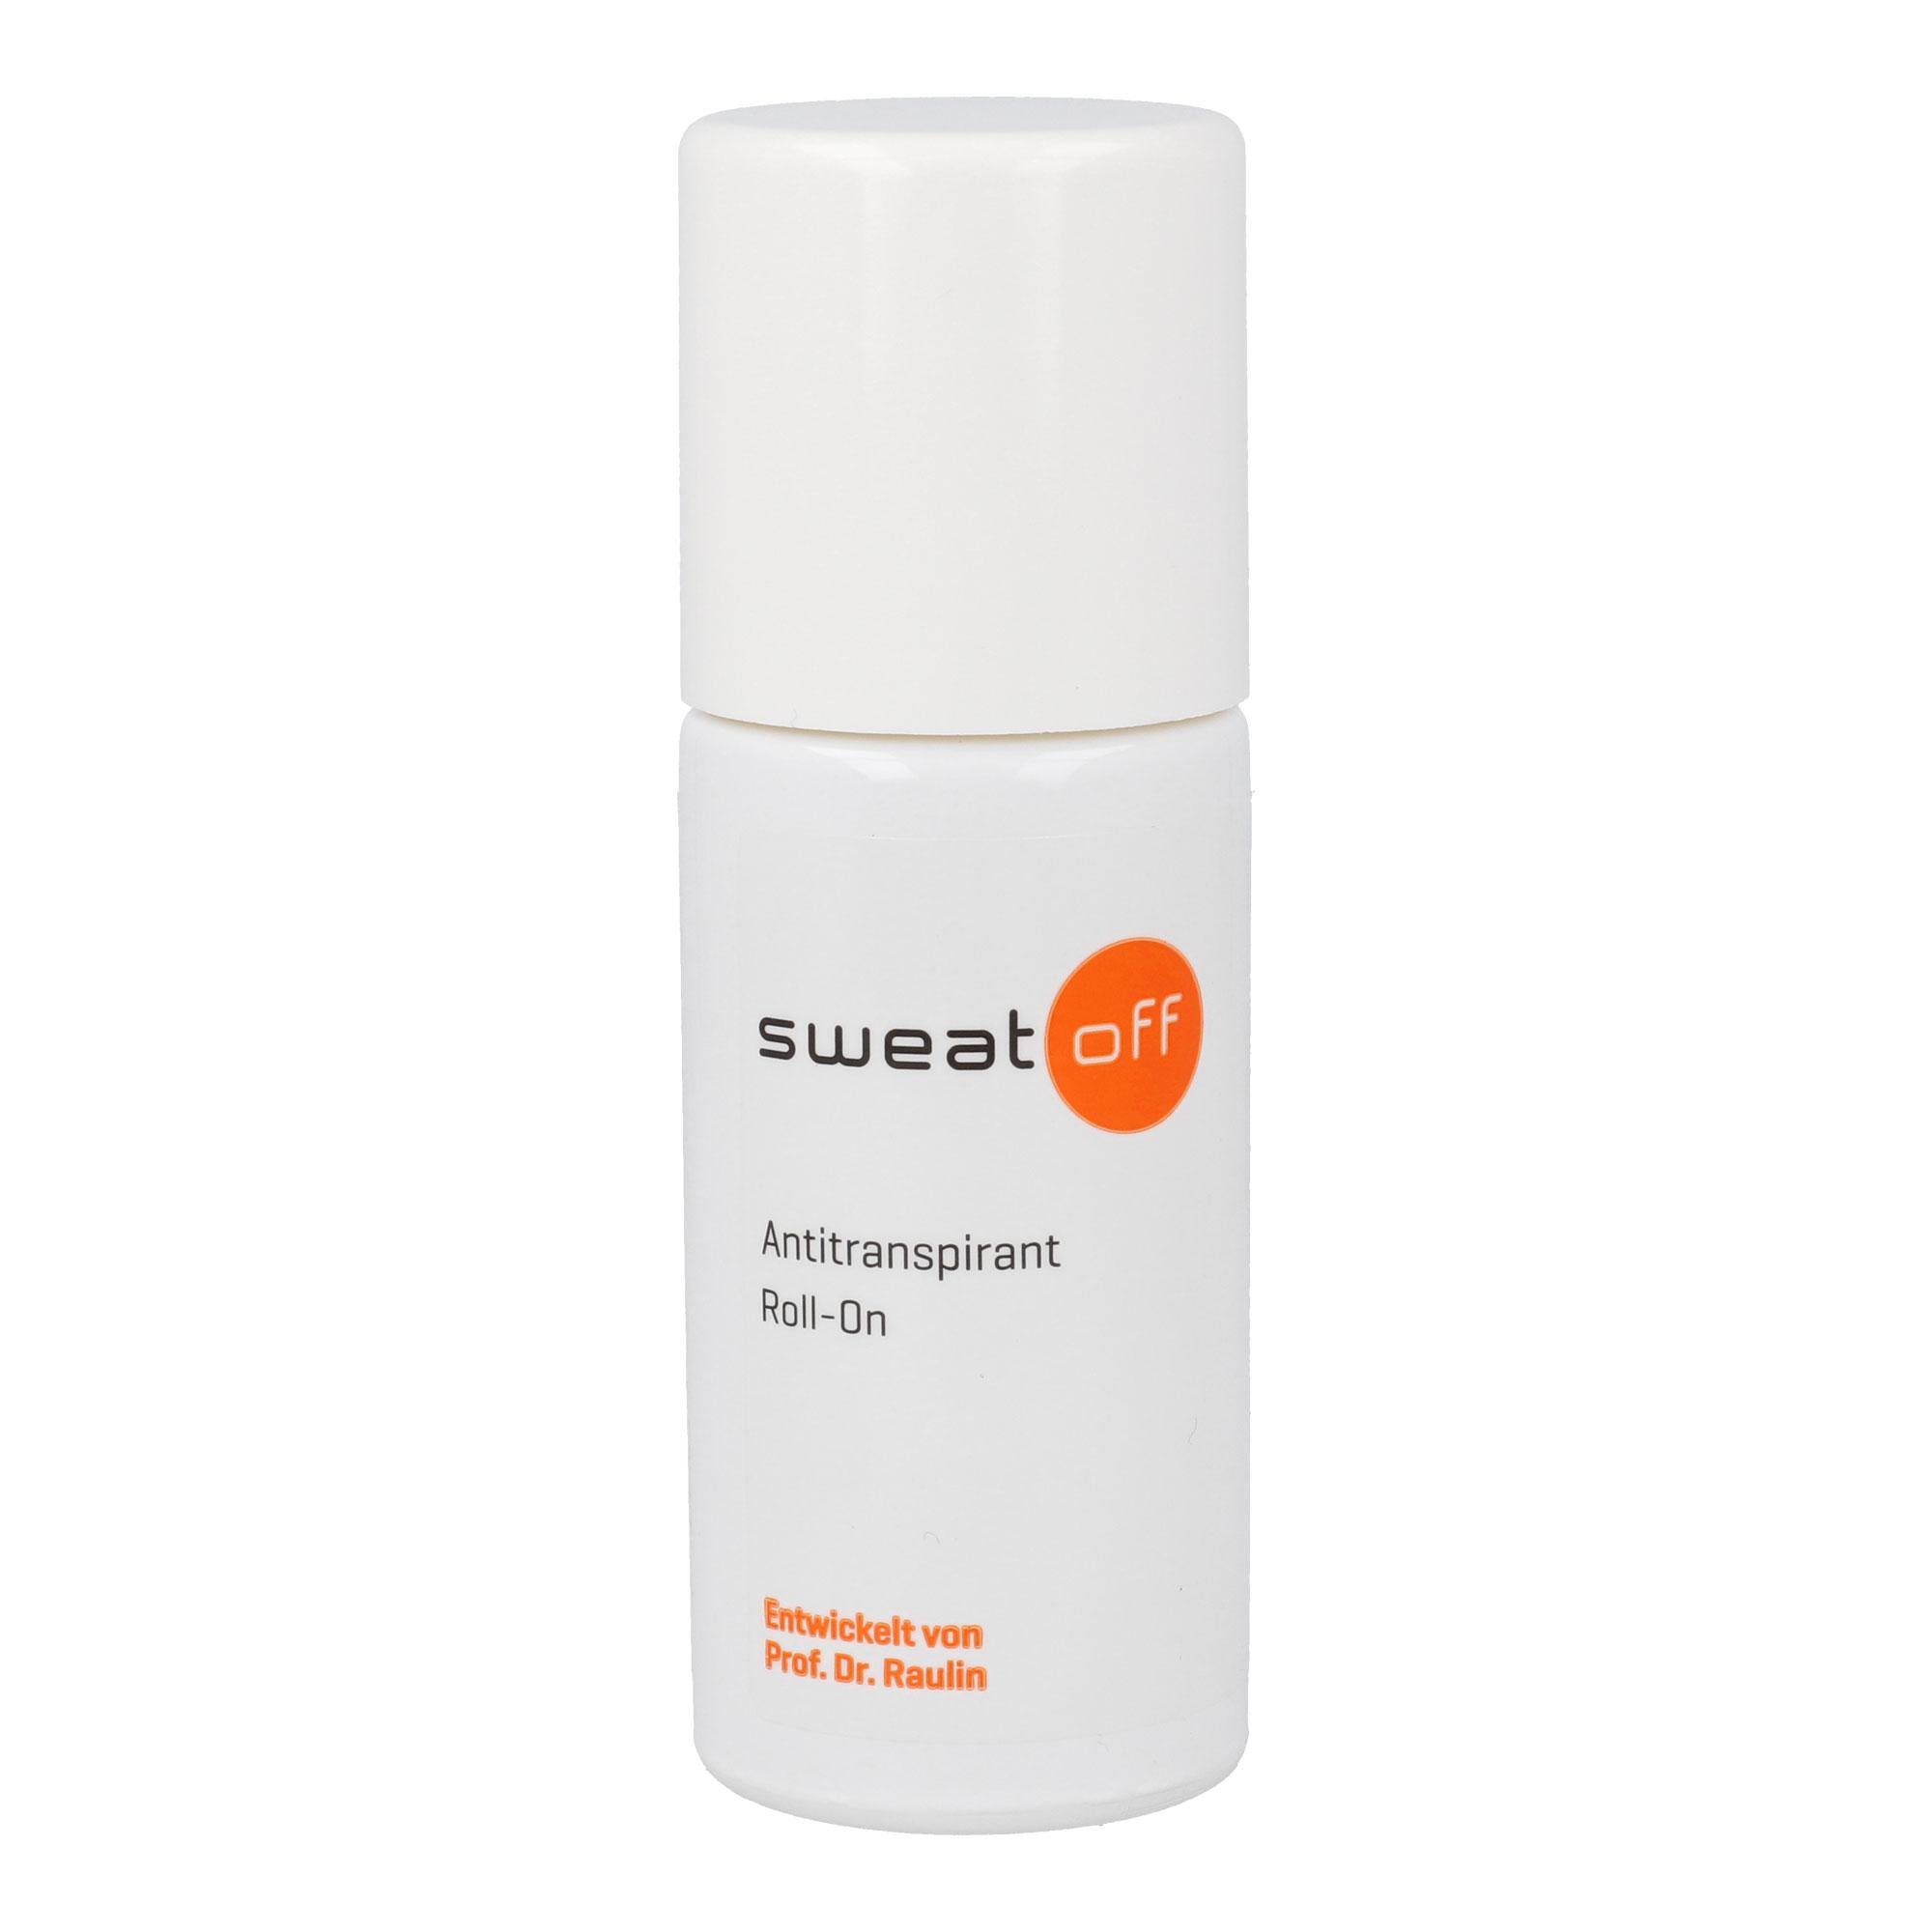 Sweat Off Antitranspirant Roll-on.